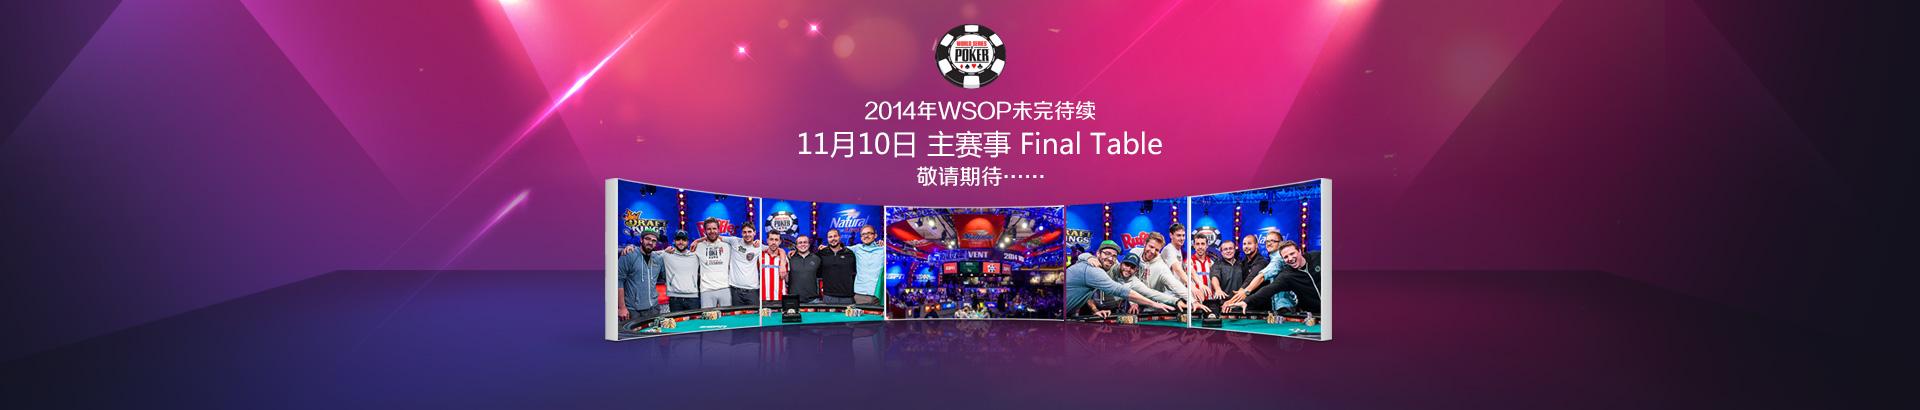 WSOP主赛九人决赛桌